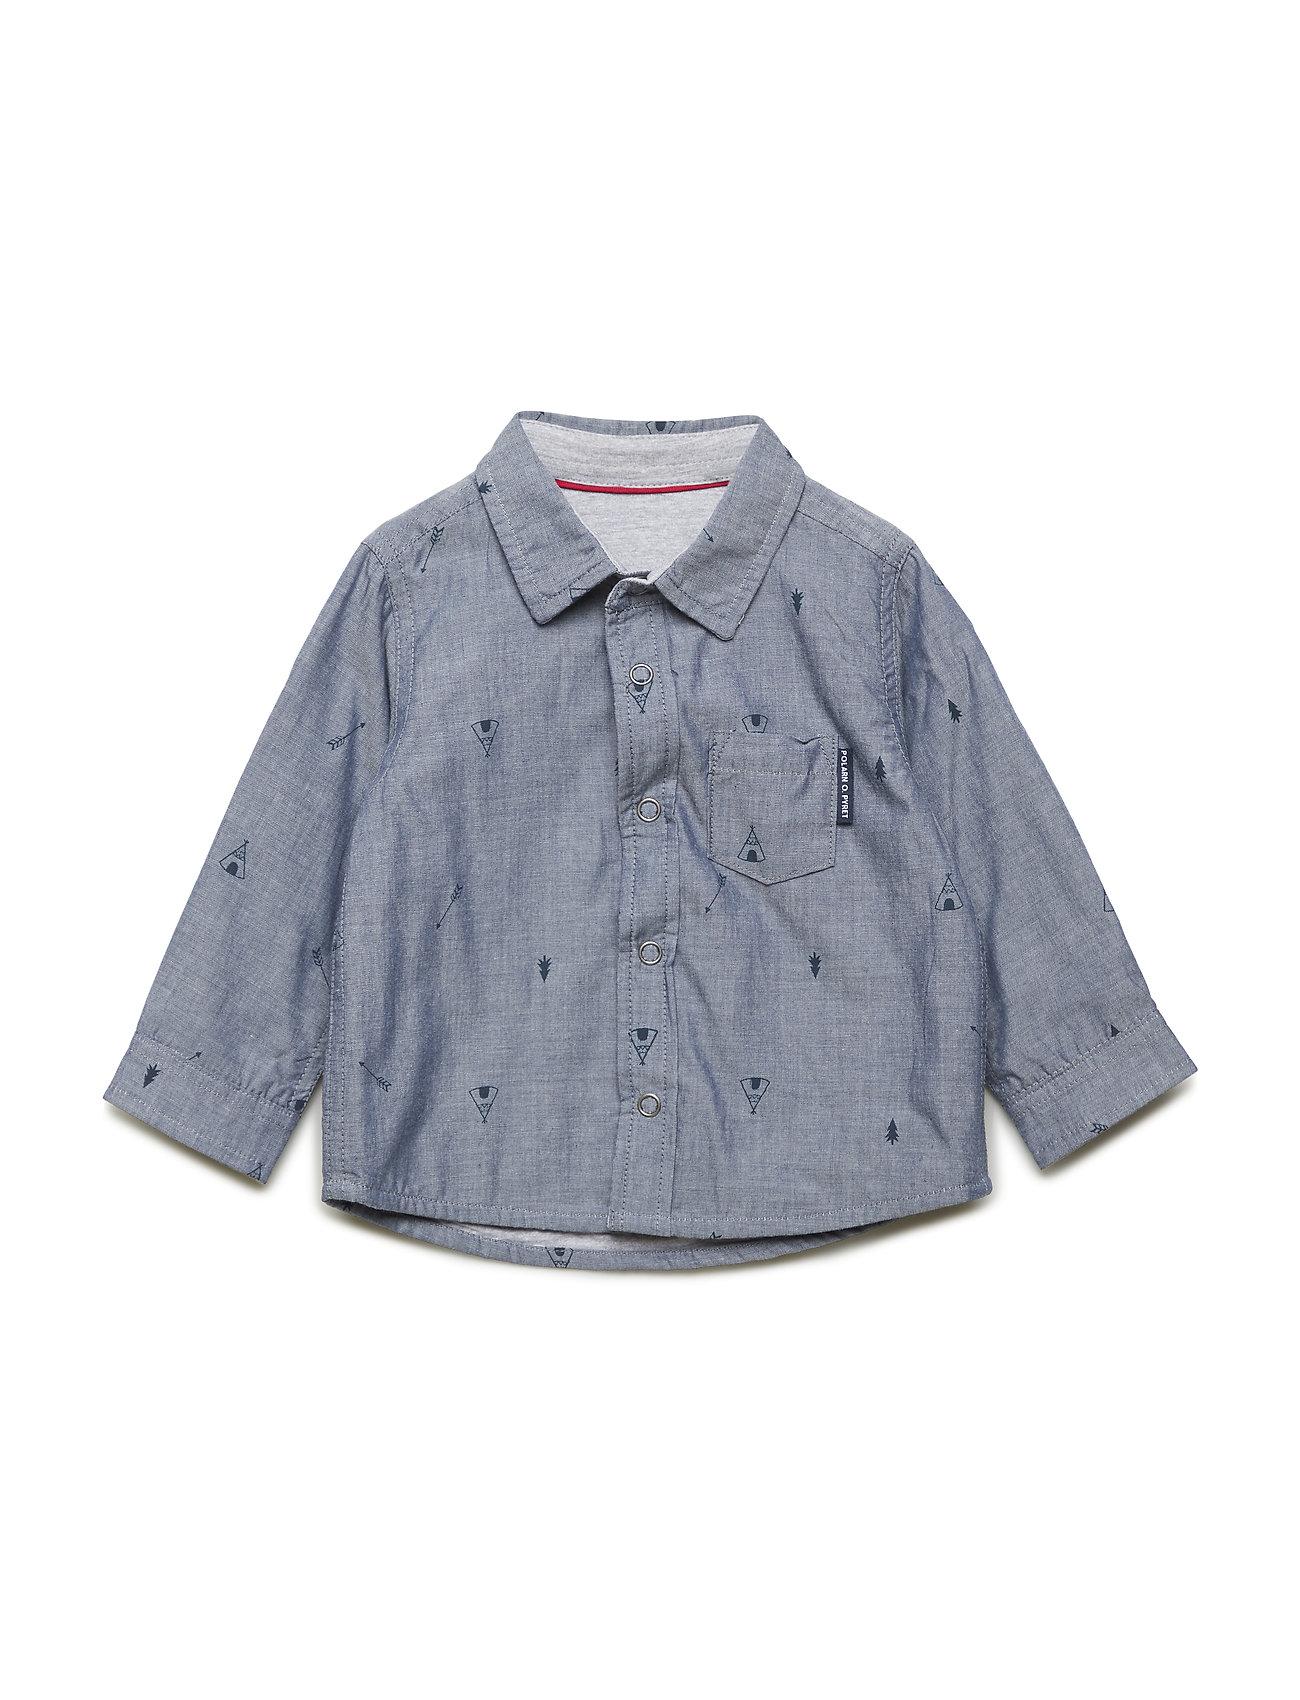 Polarn O. Pyret Shirt long sleeve AOP - CORONET BLUE